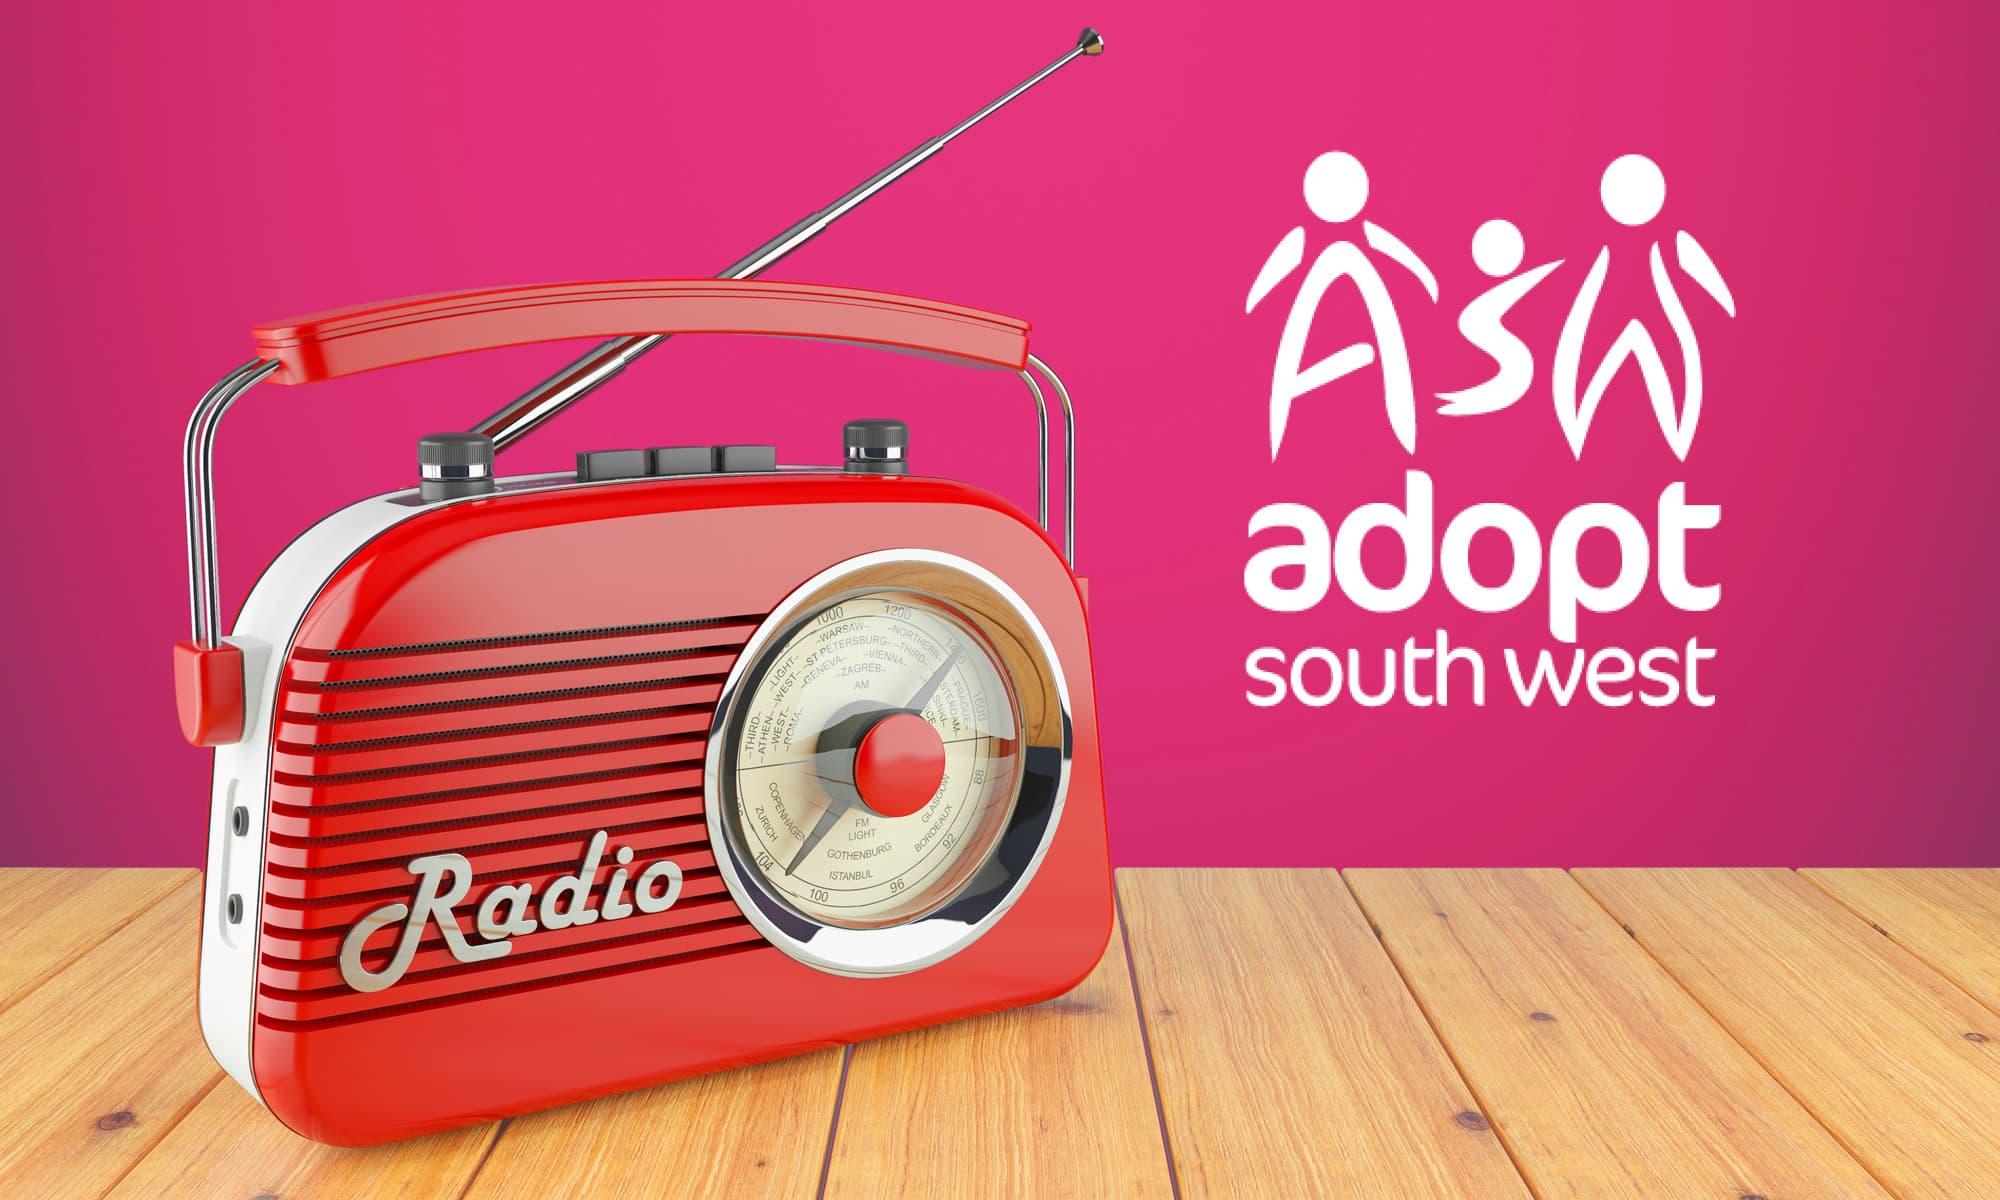 Adopt South West Radio Advert